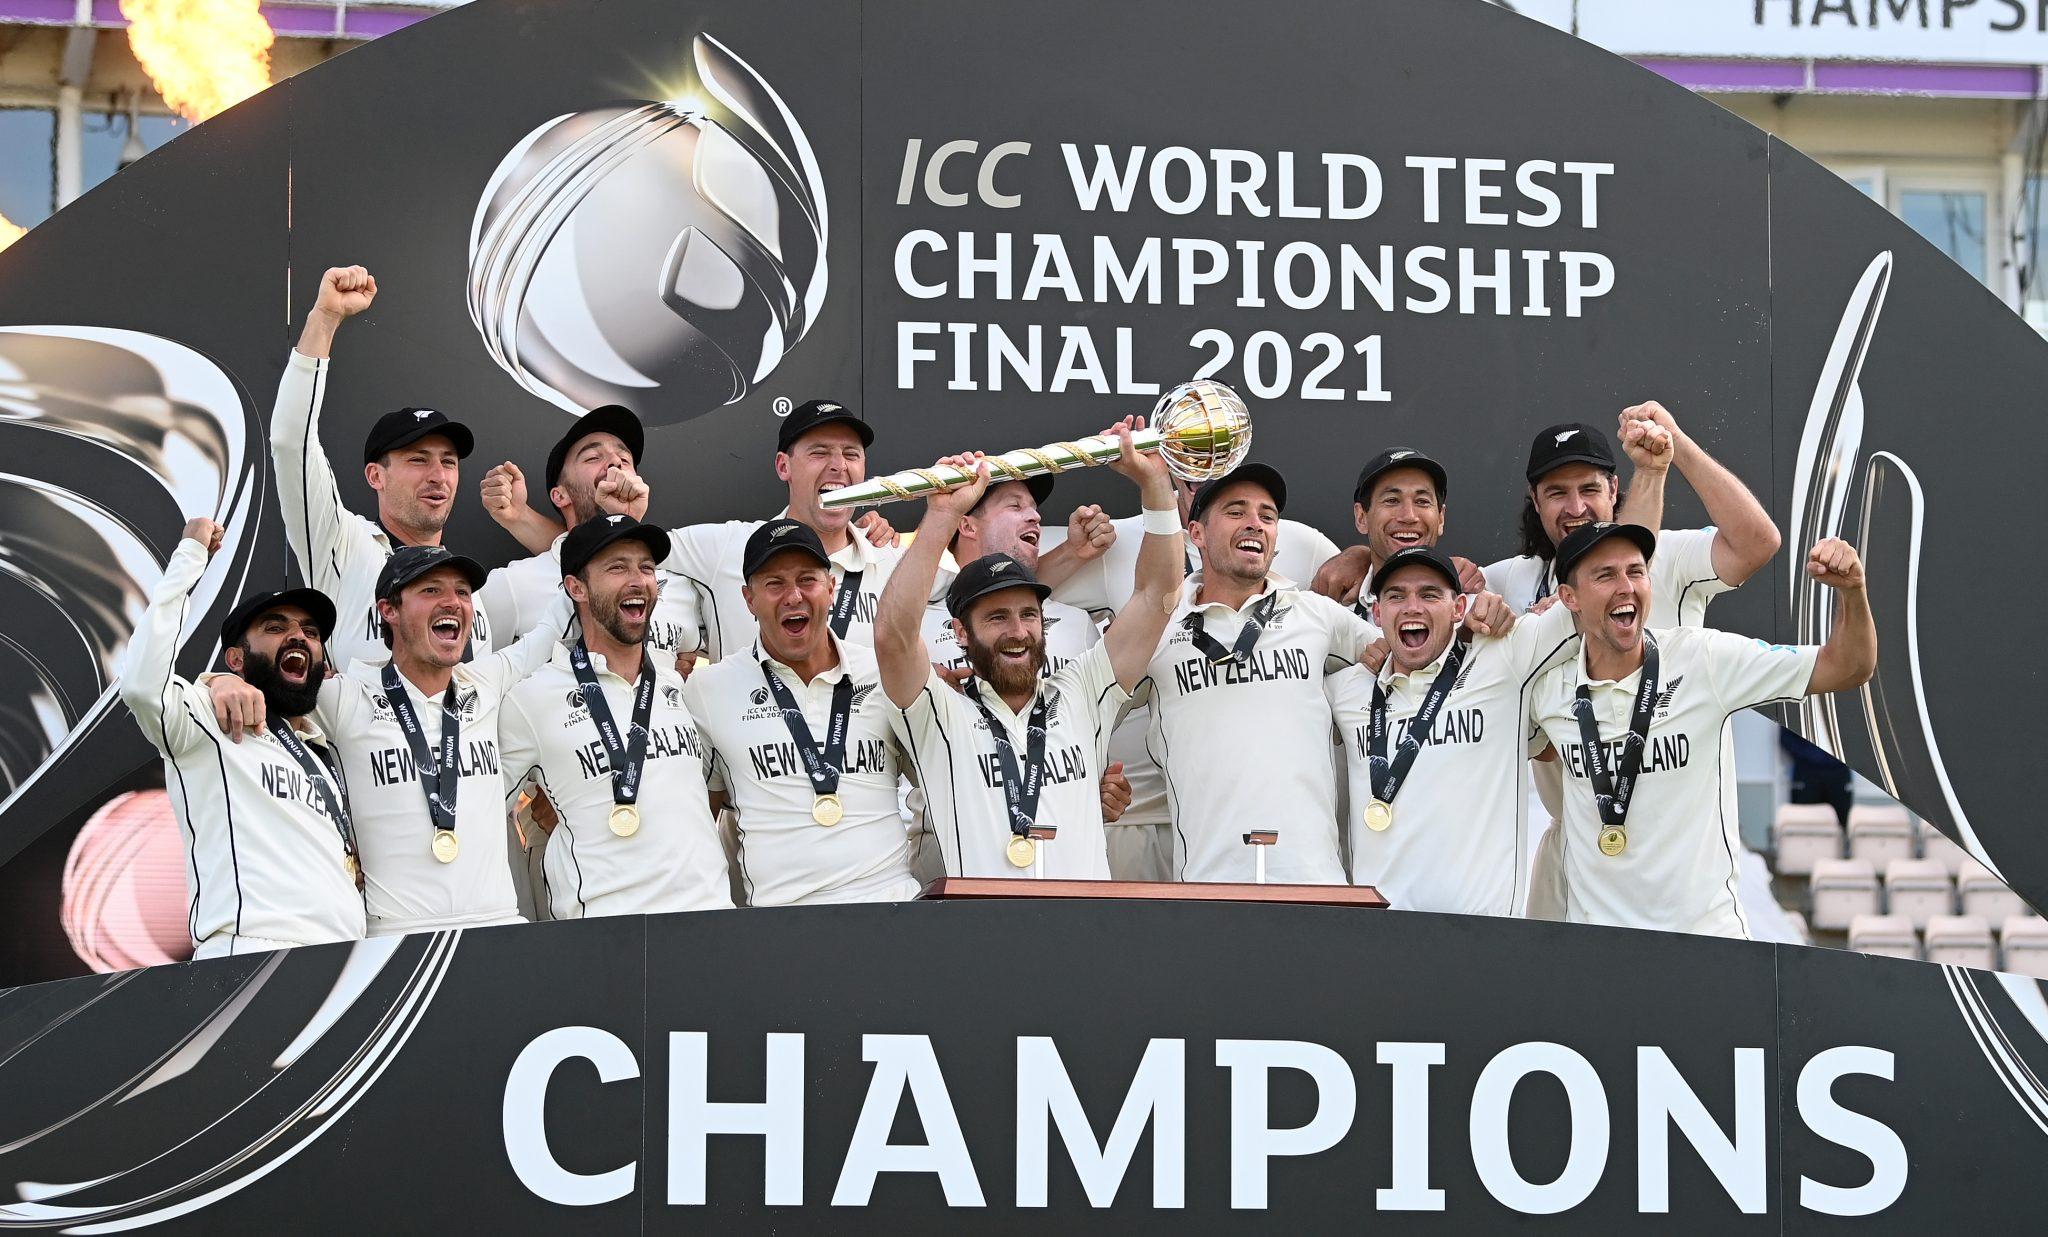 New Zealand crowned first ICC World Test Championship   న్యూజిలాండ్ మొట్టమొదటి ప్రపంచ టెస్ట్ ఛాంపియన్ షిప్ గెలుచుకున్నది  _40.1